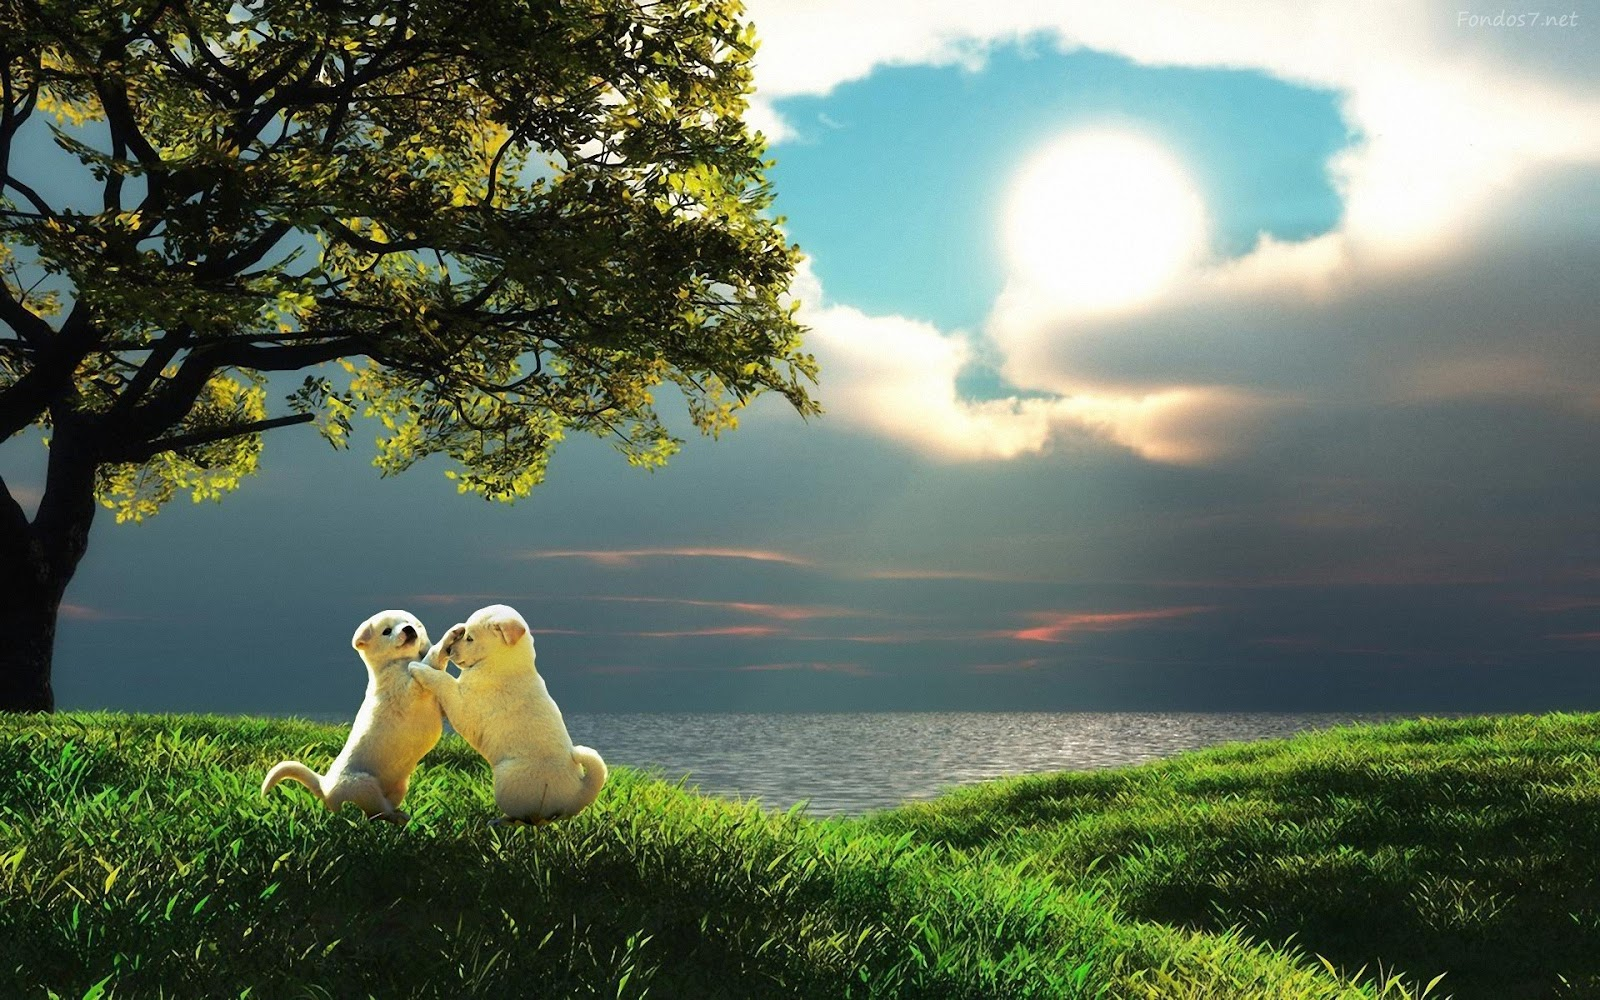 Perros Husky Siberiano Fondos De Pantalla Hd De Animales 2: Trololo Blogg: Wallpaper Hd De Cachorros